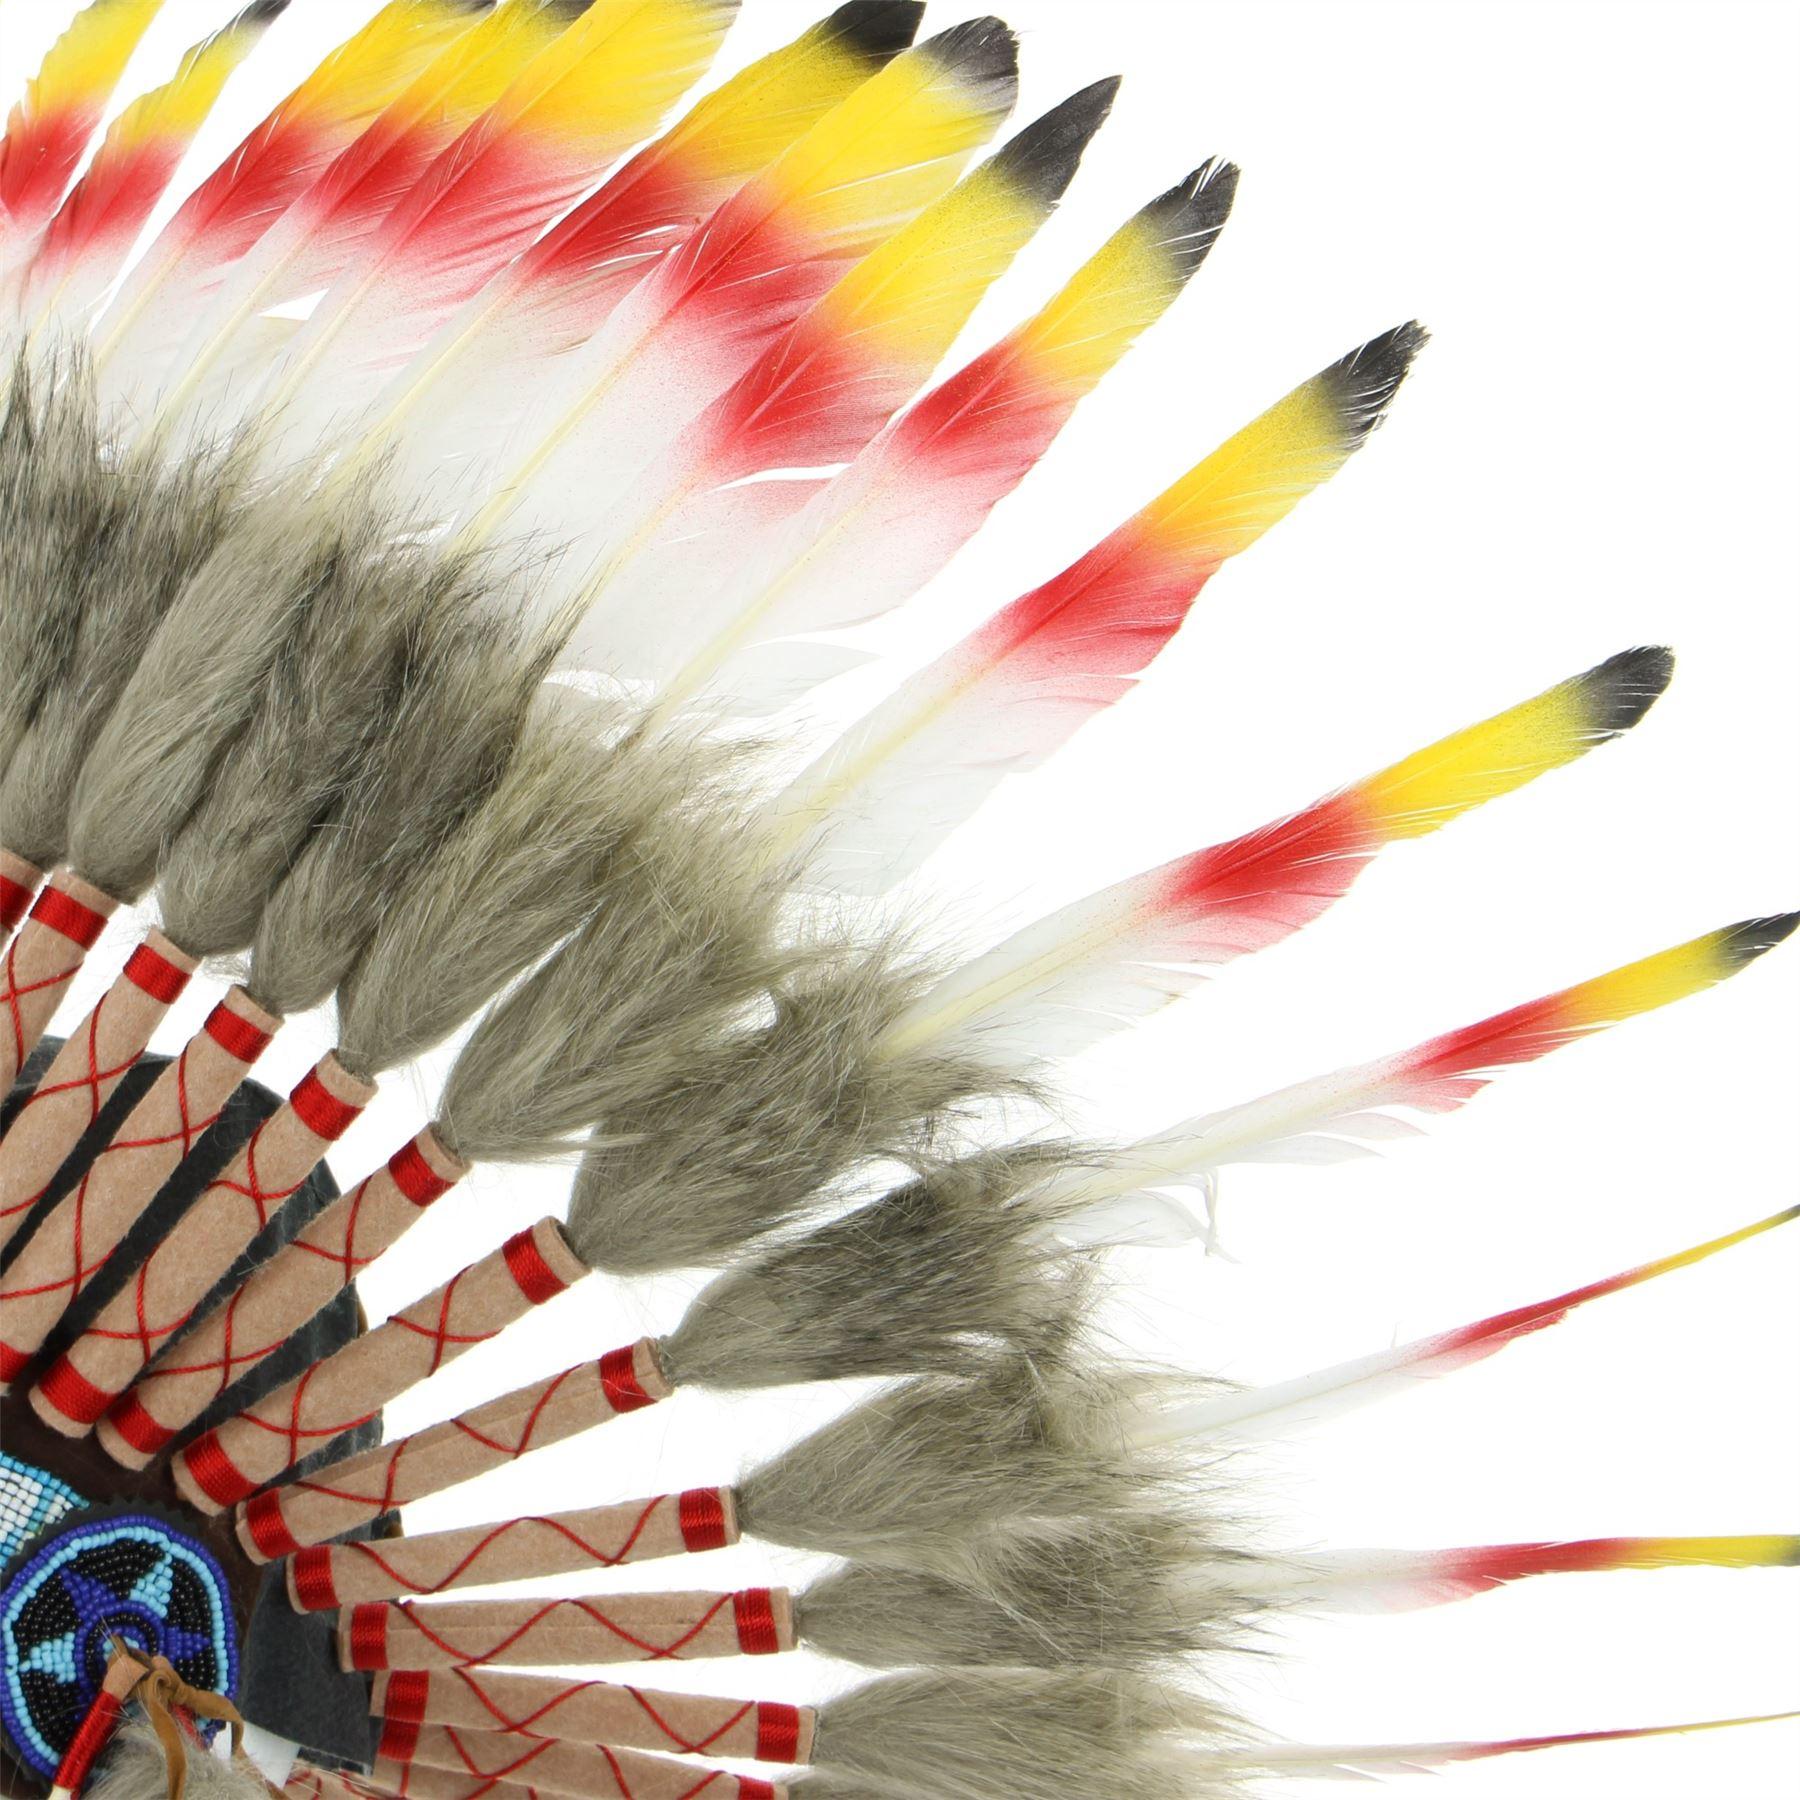 8bd8e4d446ea2 Penacho indio jefe plumas sombrero nativo americano Gringo rojo negro  amarillo. Acerca de este producto. Imagen 1 de 3  Imagen 2 de 3  Imagen 3  de 3